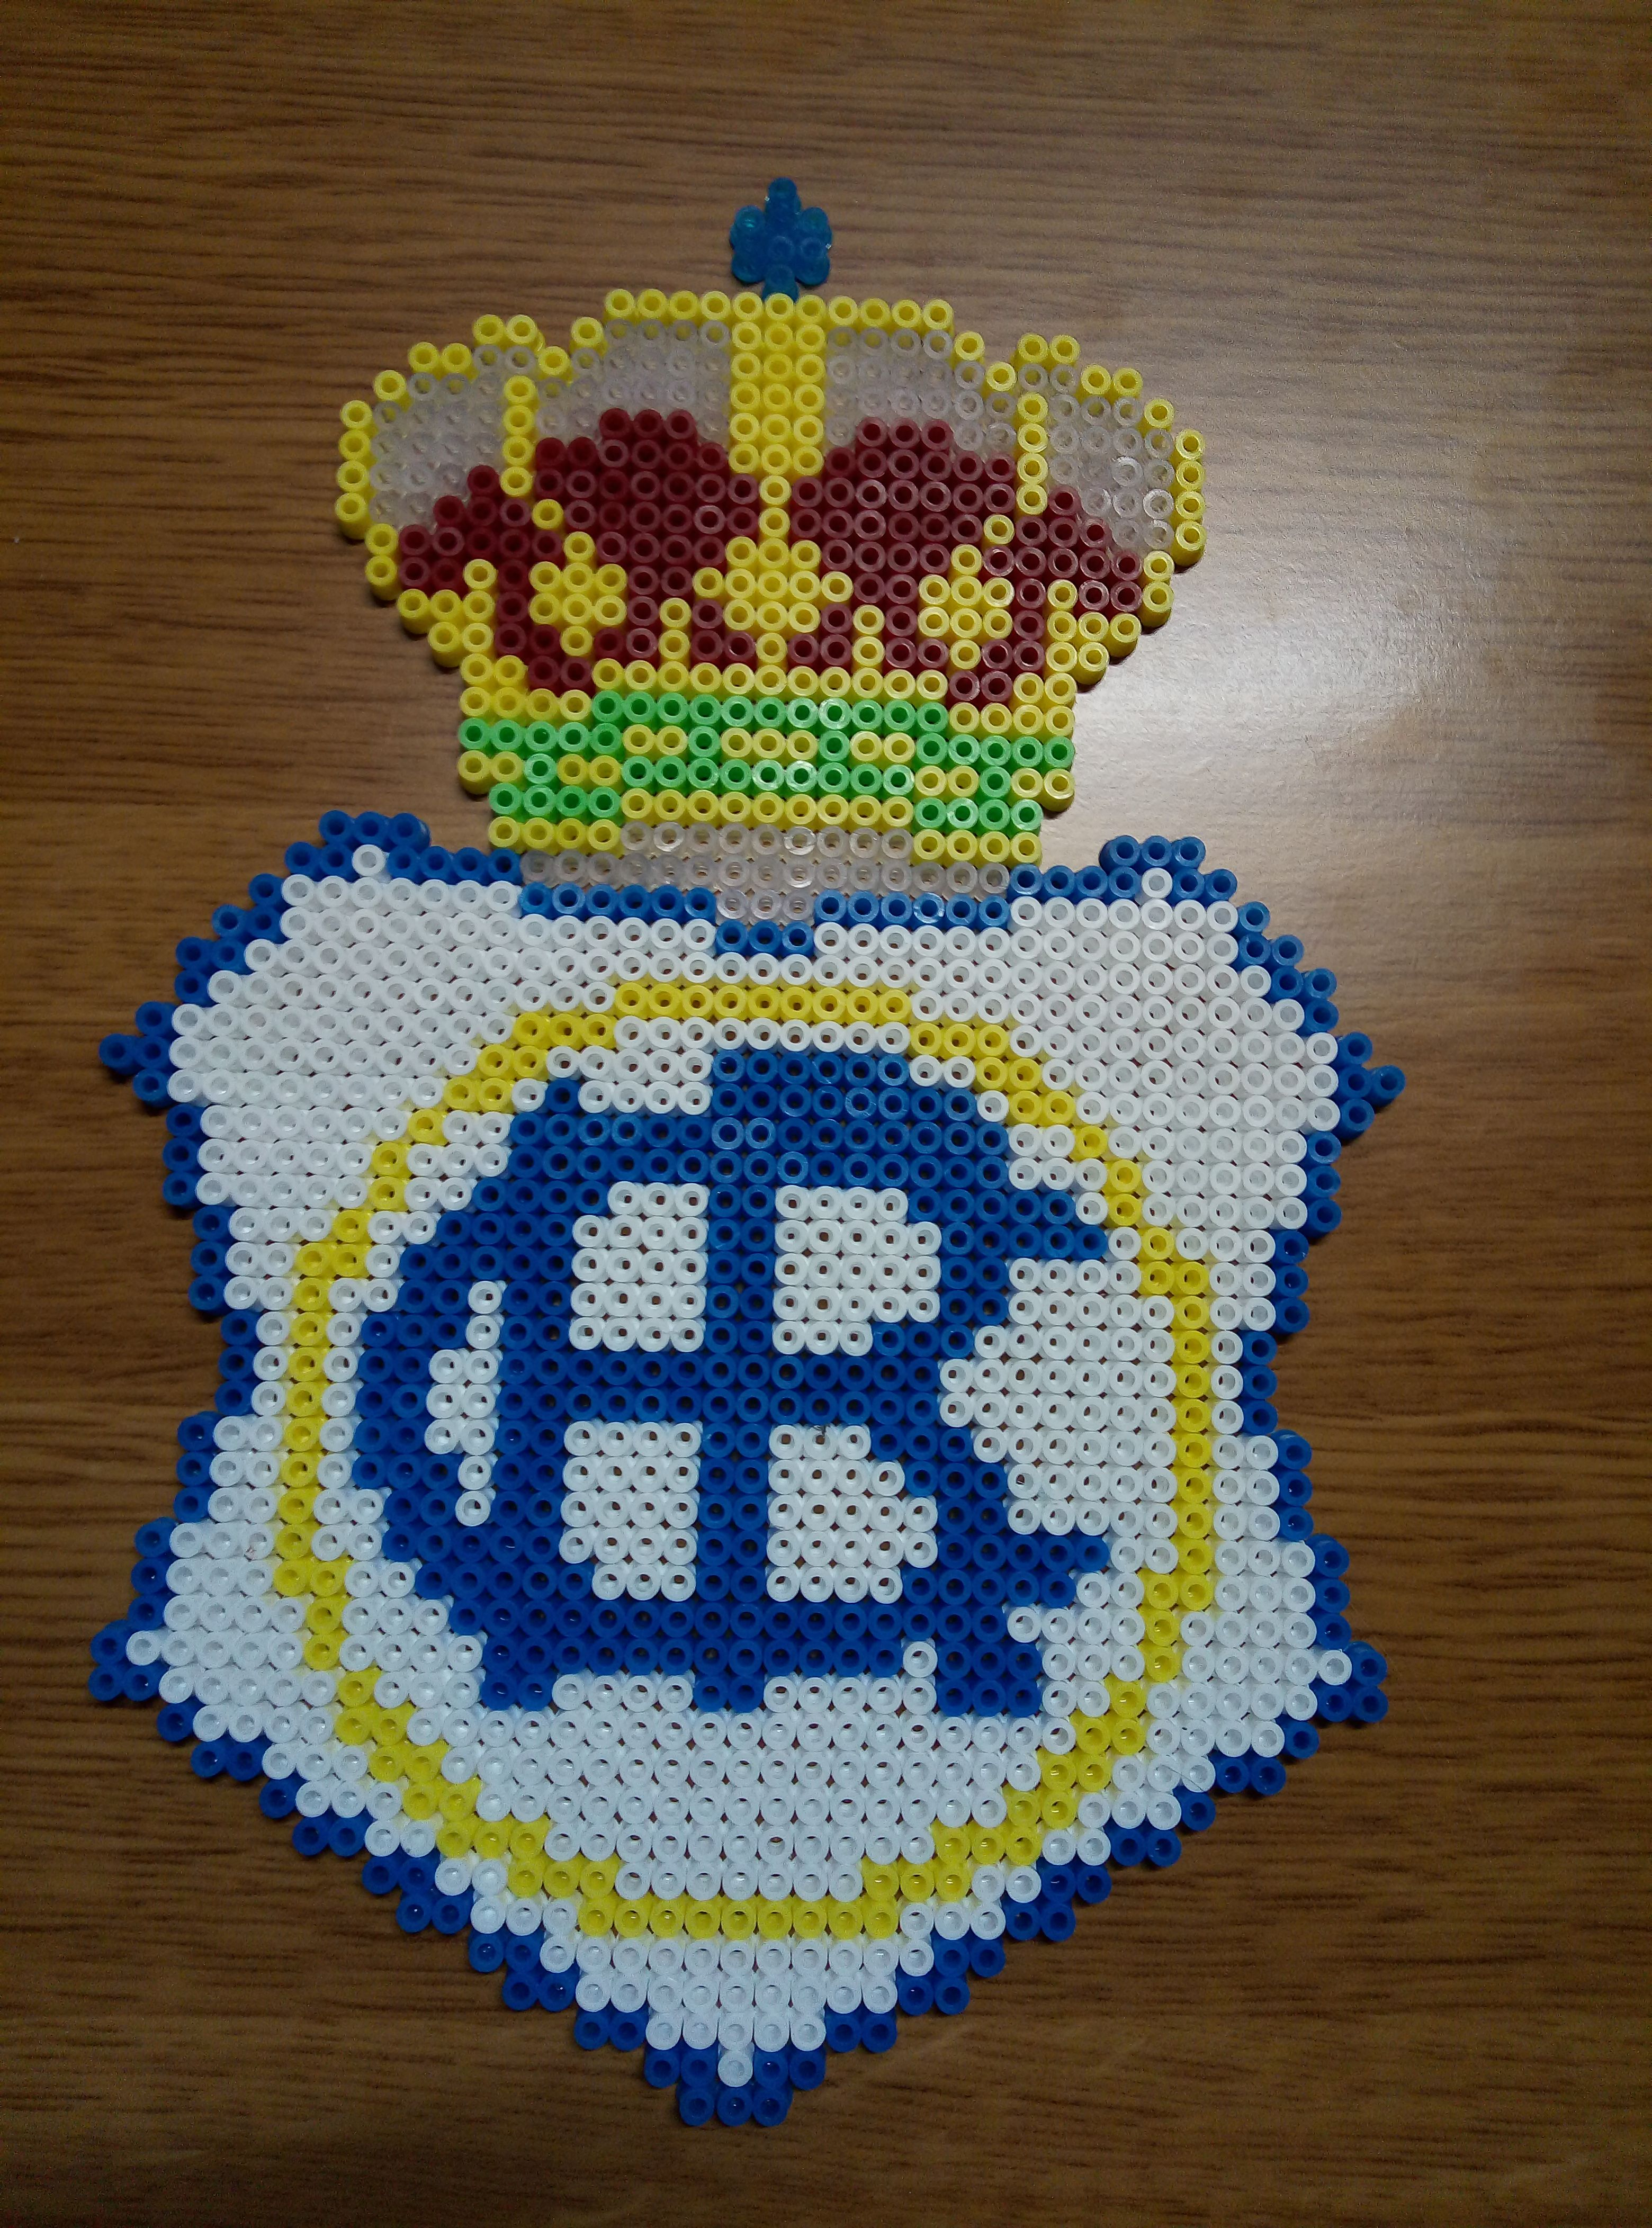 Real Club Recreativo Huelva Hama Beads Hama Beads Punto De Cruz Babero Escudos De Equipos